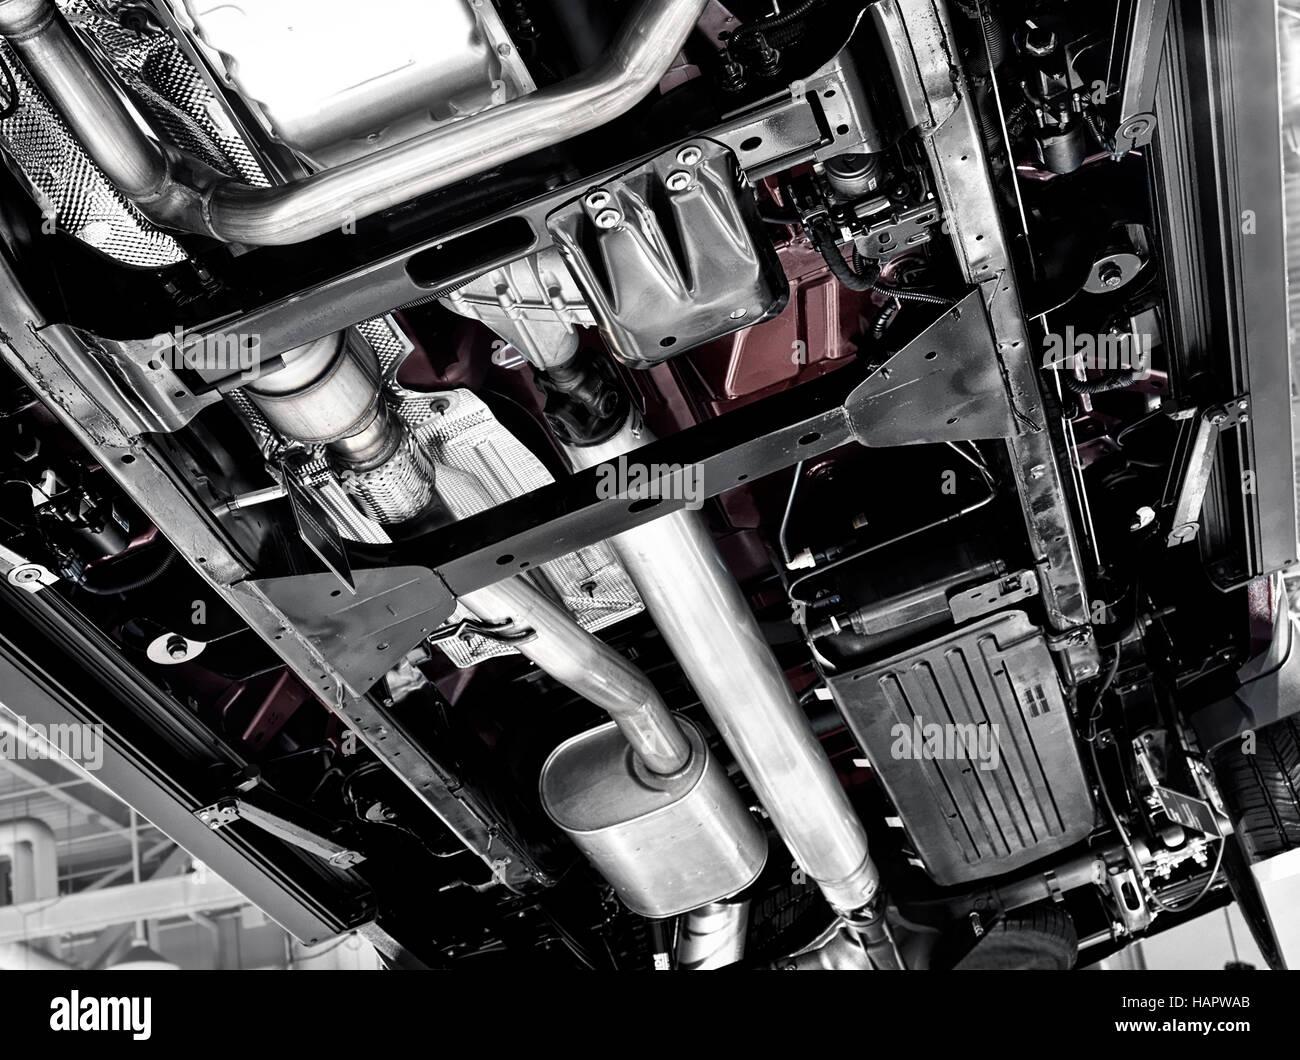 https www alamy com stock photo 2017 chevrolet silverado 1500 pickup truck bottom underside showing 127121971 html